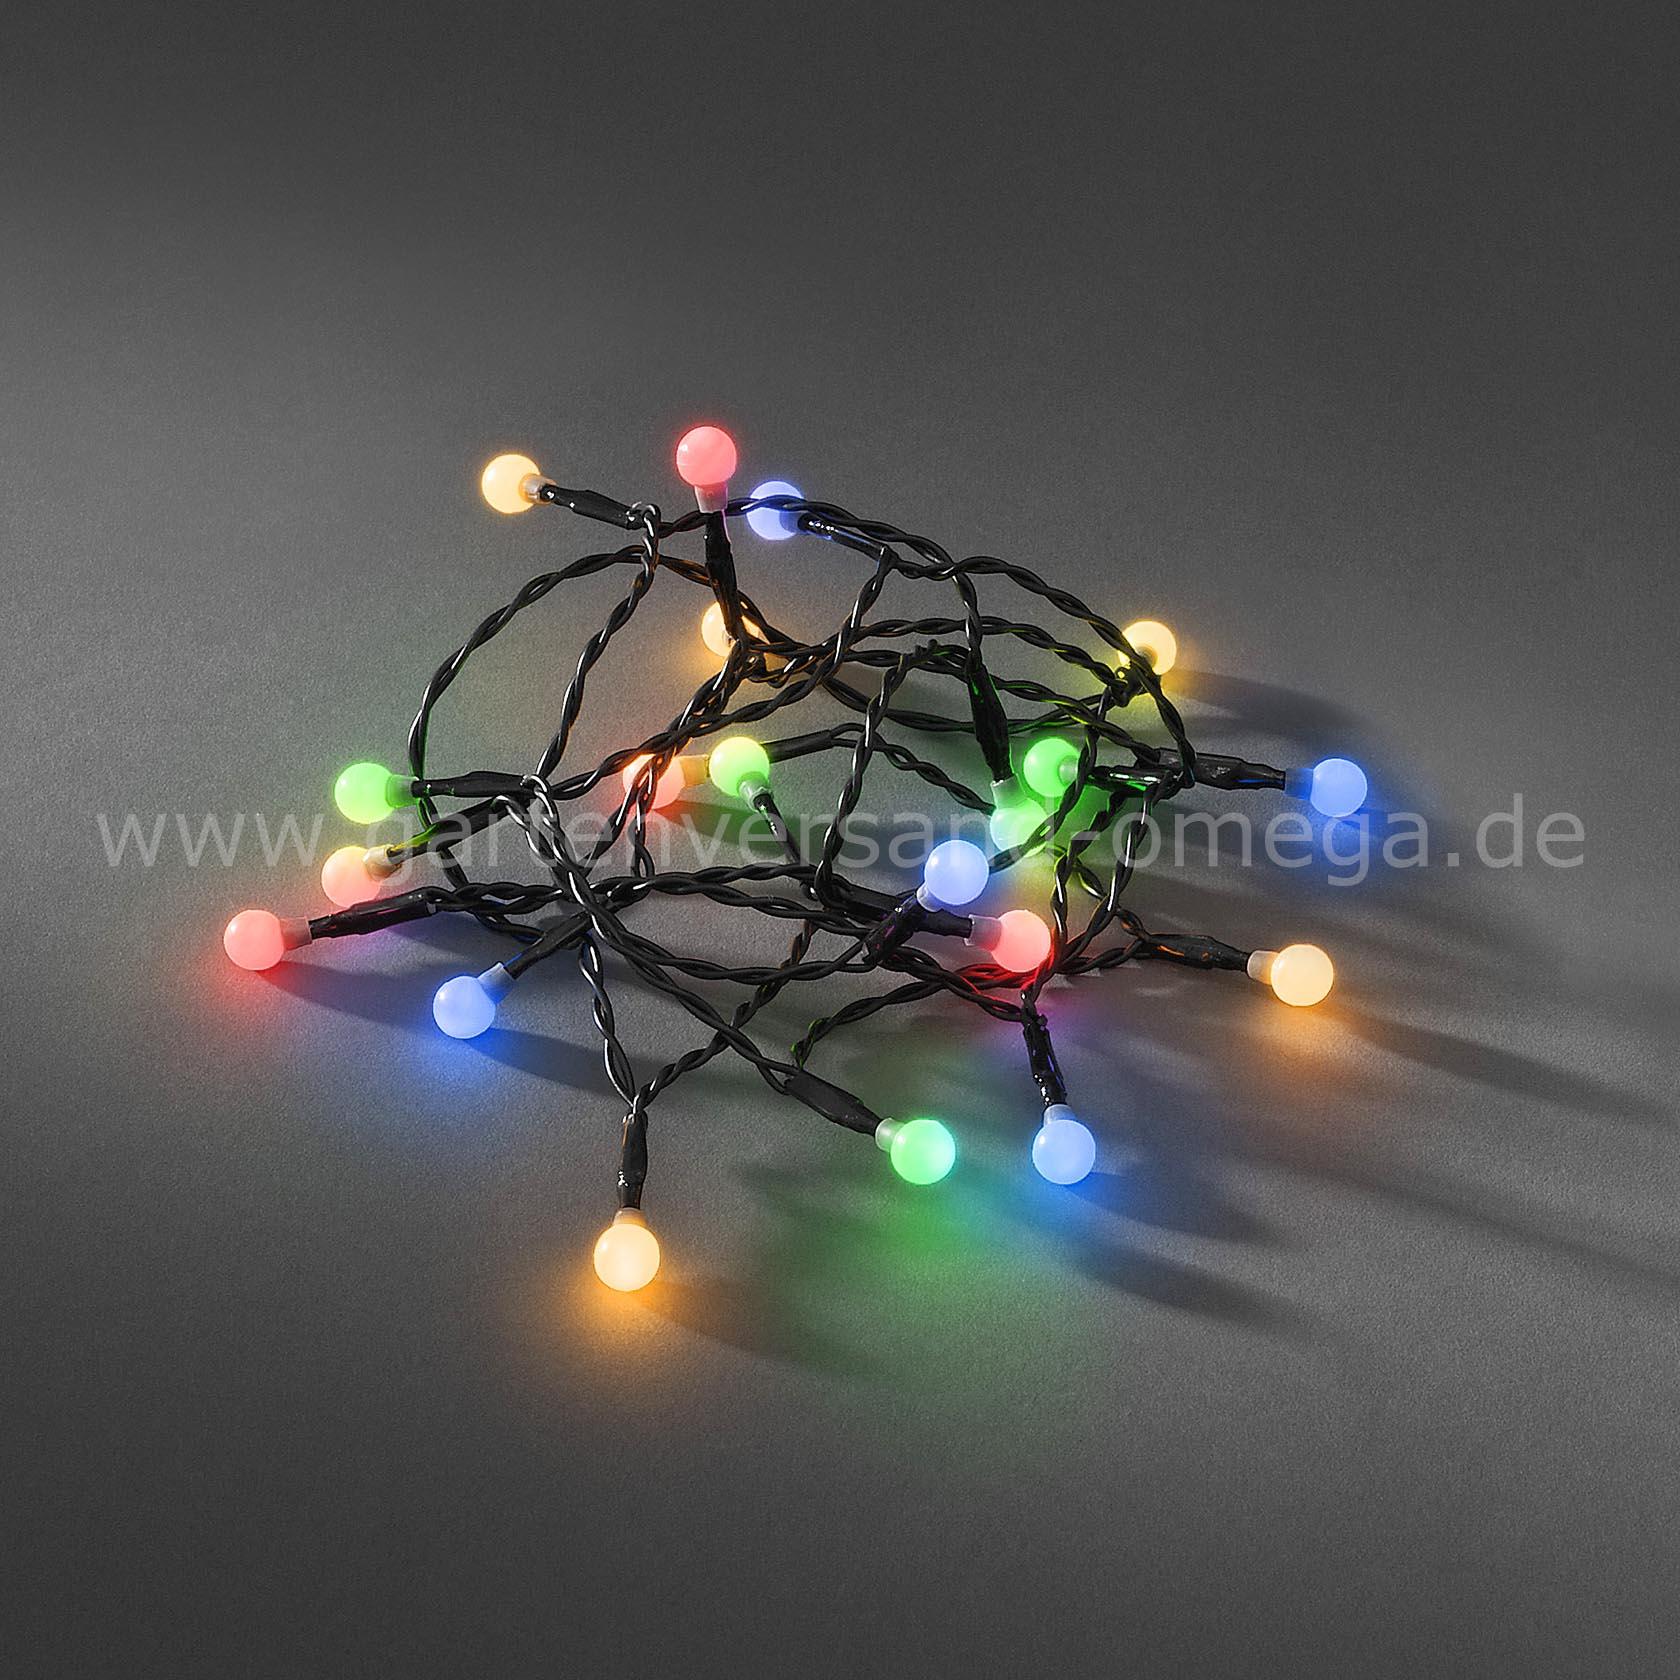 led kugellichterkette bunt multicolor lichterkette bunte led lichterkette. Black Bedroom Furniture Sets. Home Design Ideas